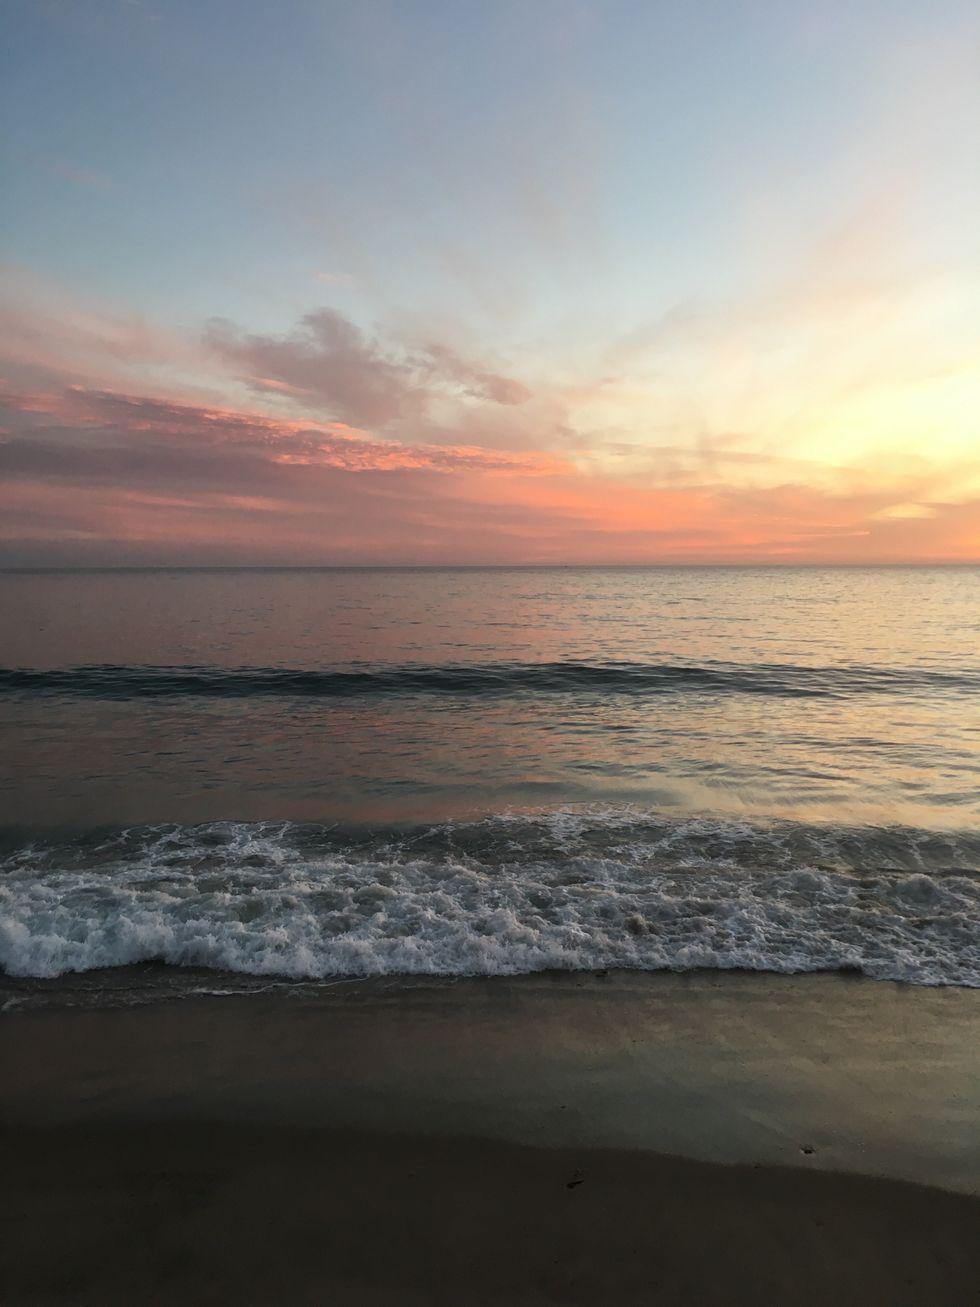 My Reflection Of Rachel Carson's 'The Marginal World'